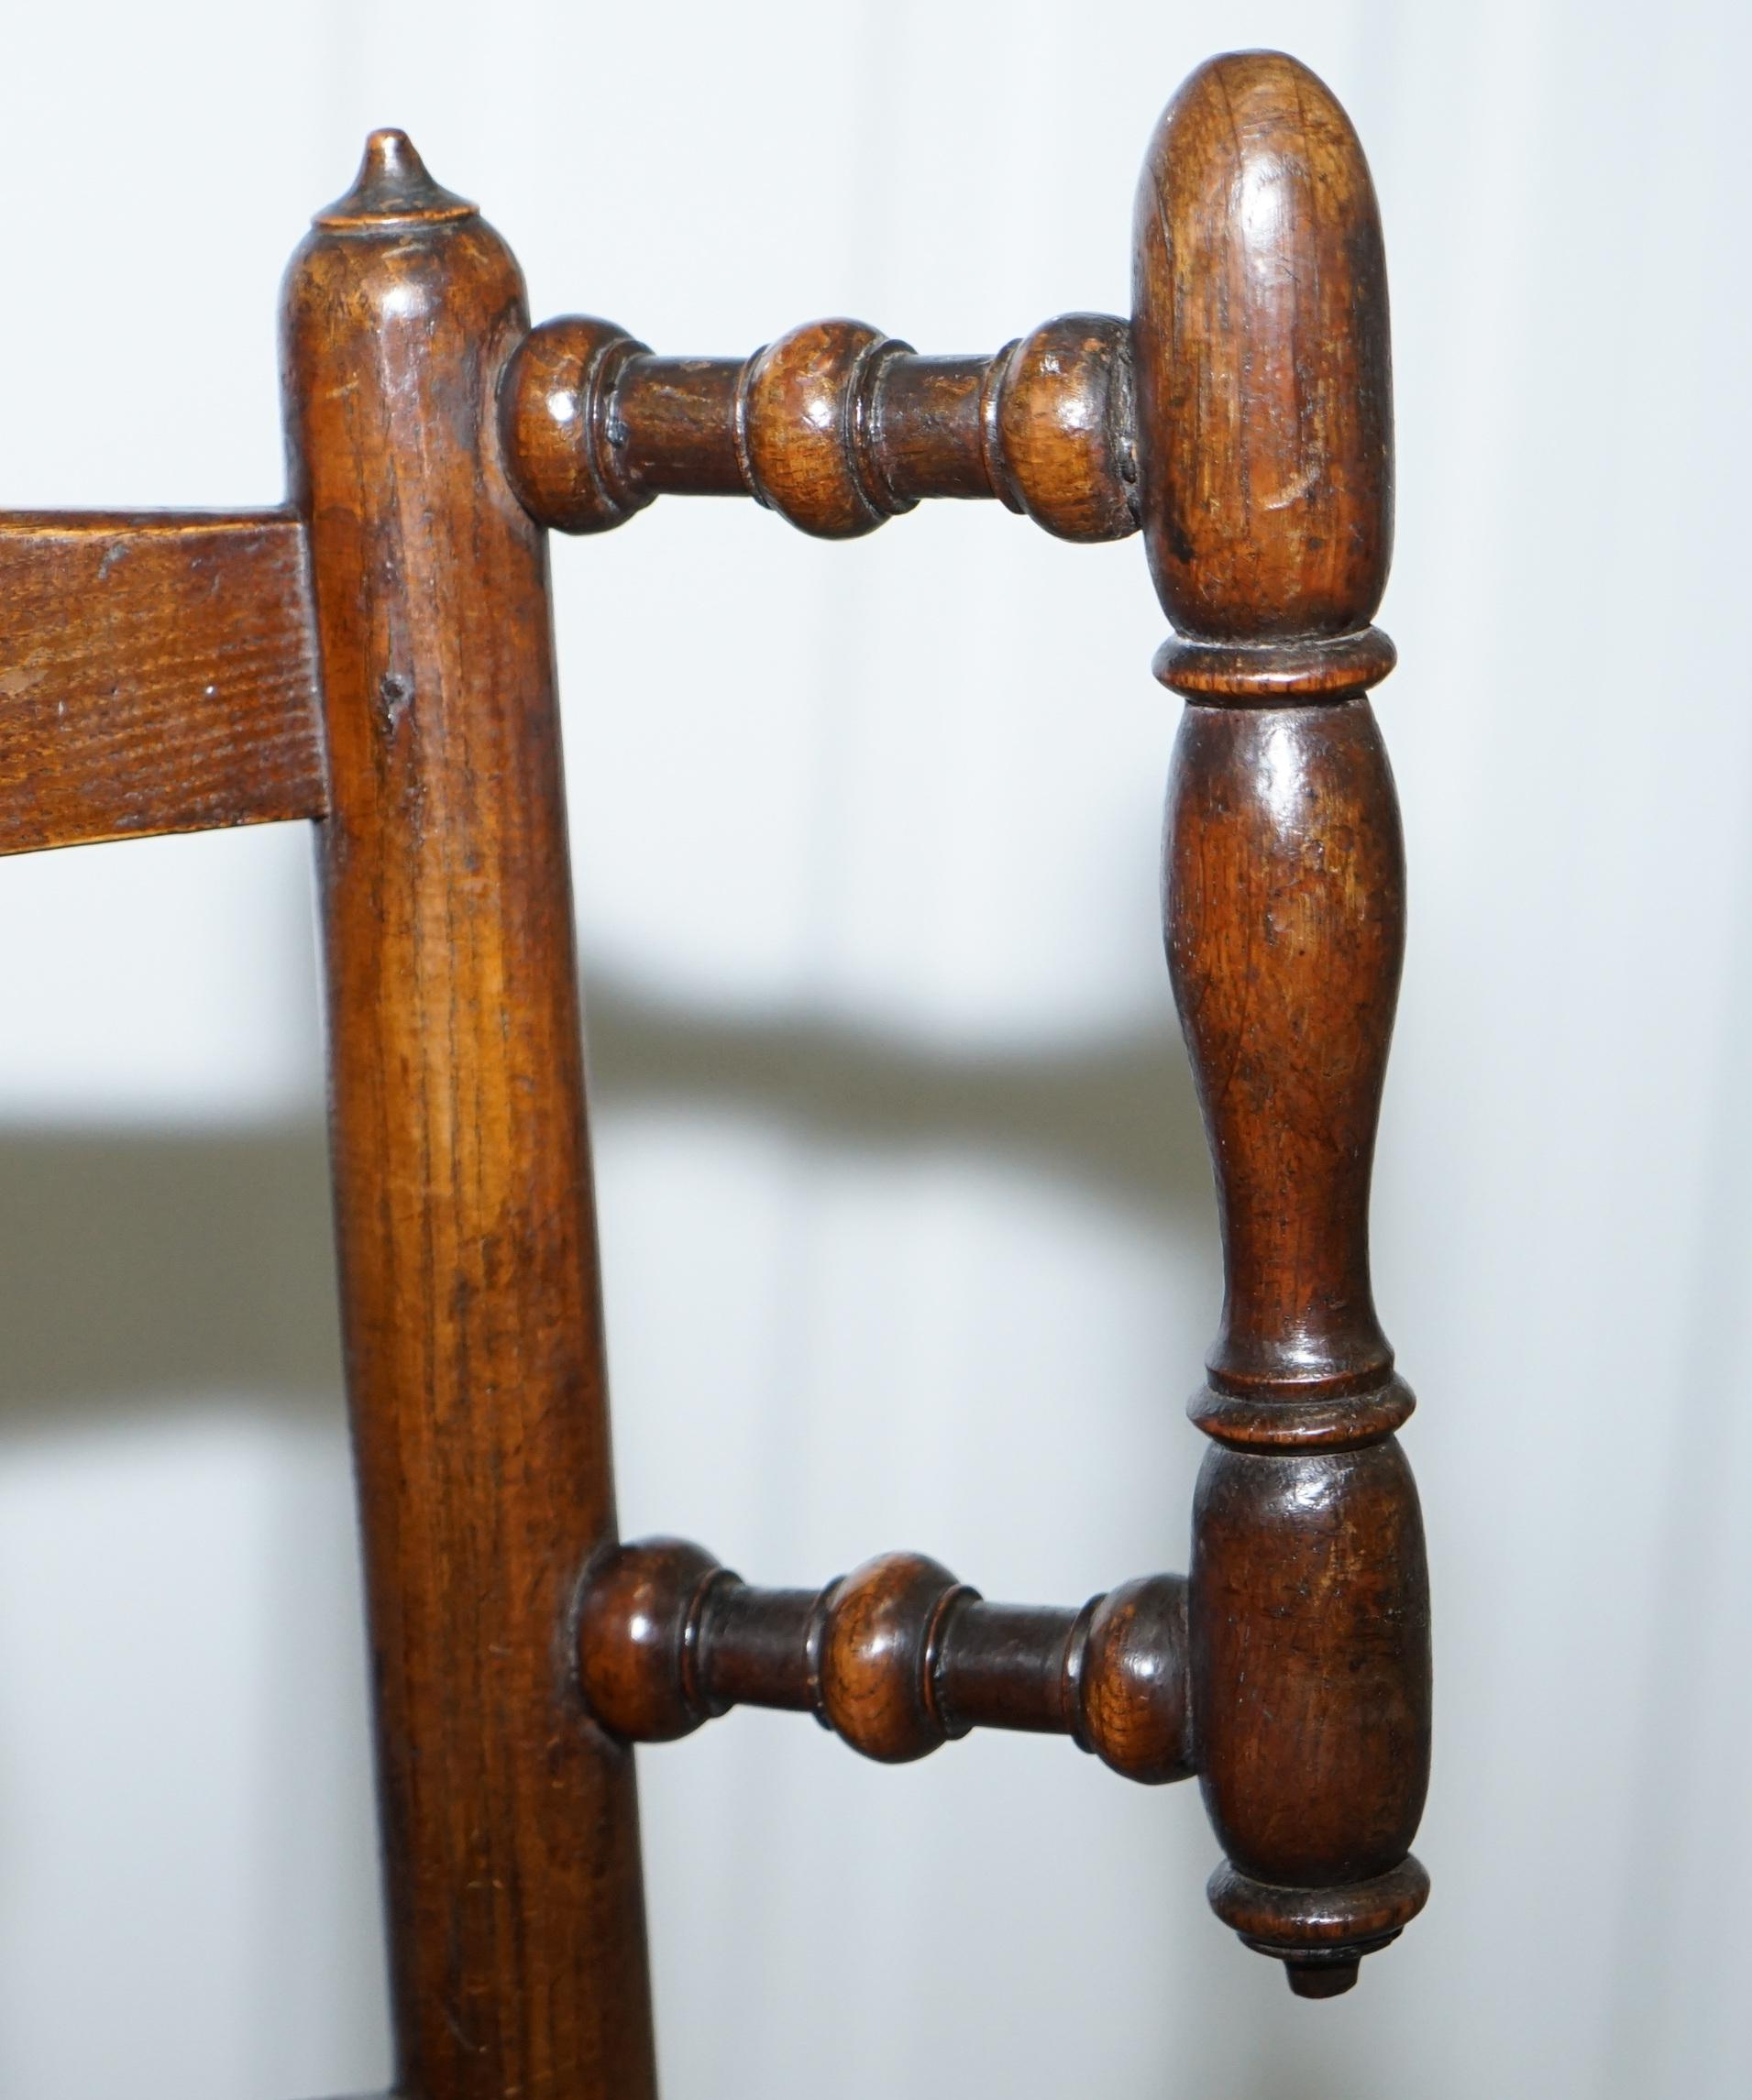 Stupendous Rare Childrens Small Antique Rope Seat Georgian Rocking Chair Solid Elm Display Machost Co Dining Chair Design Ideas Machostcouk